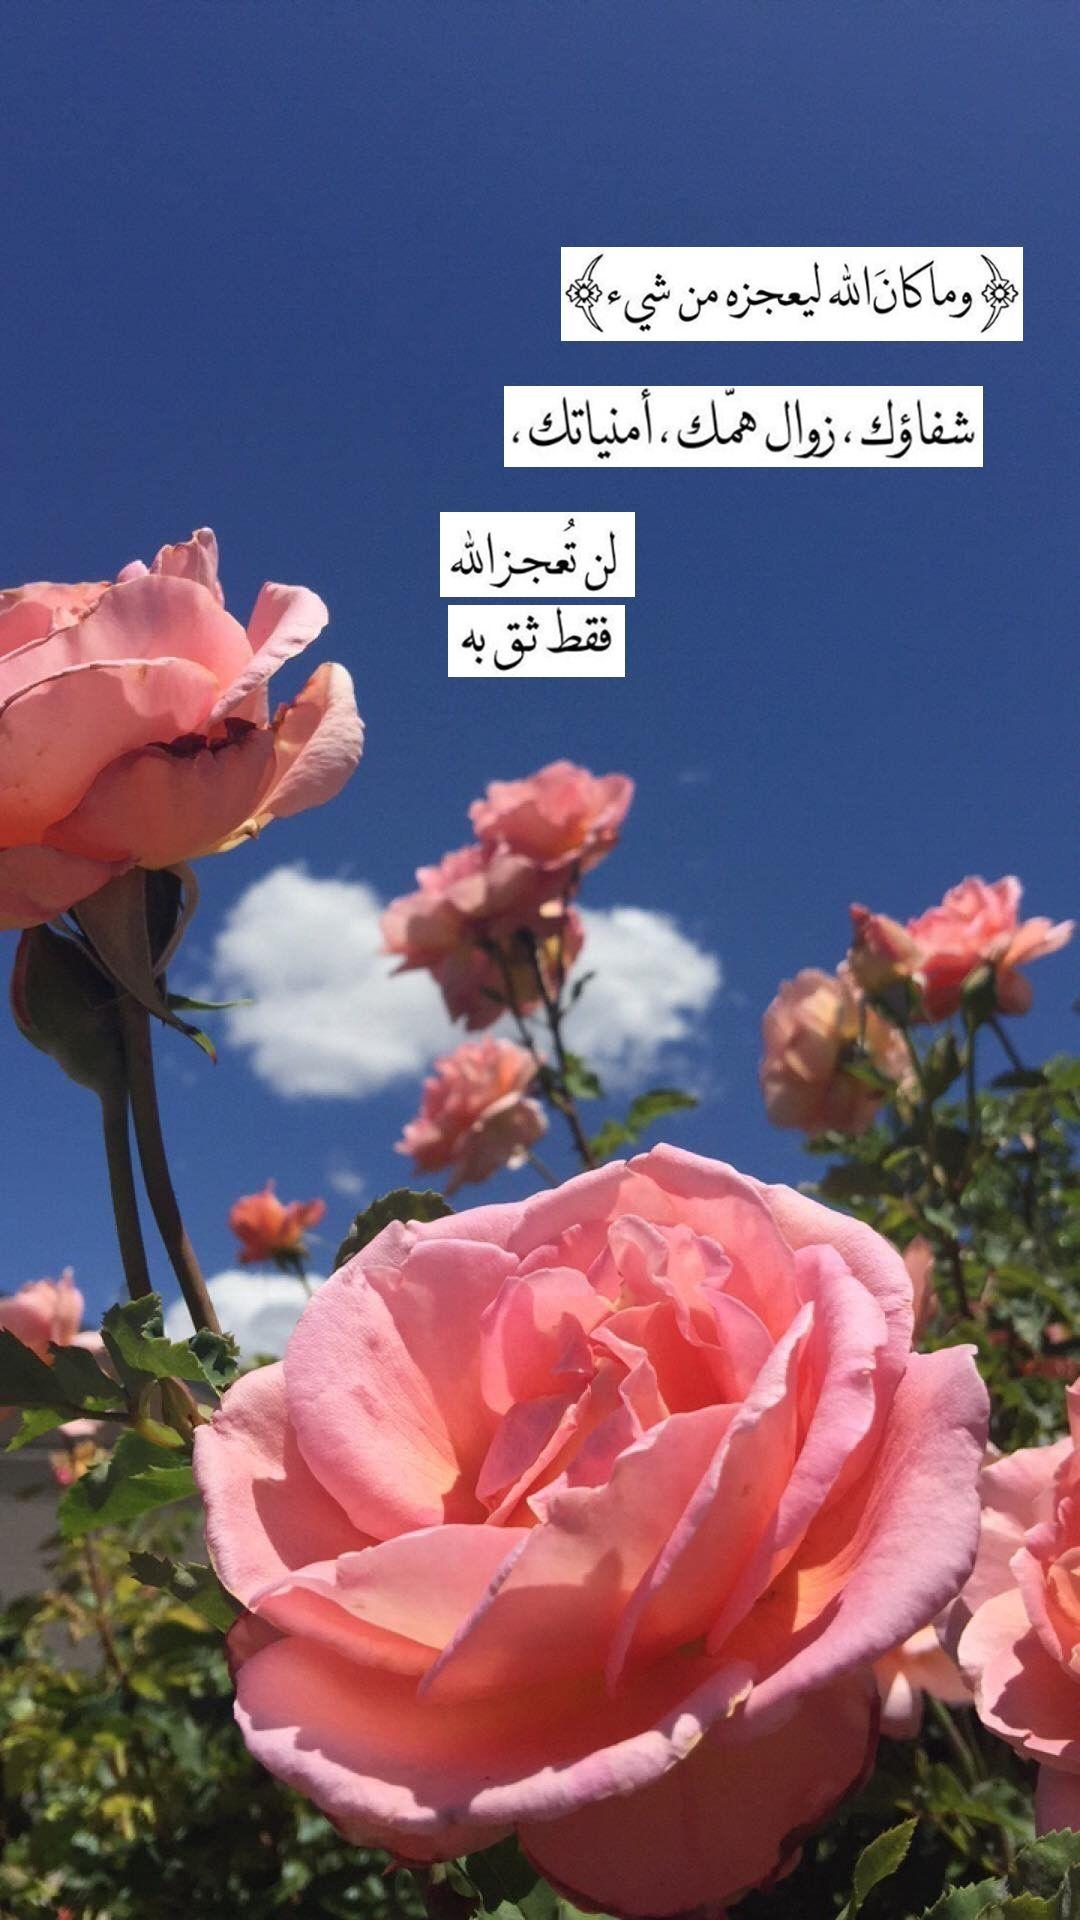 Pin By Ainar On لا إله إلا الله In 2019 Flower